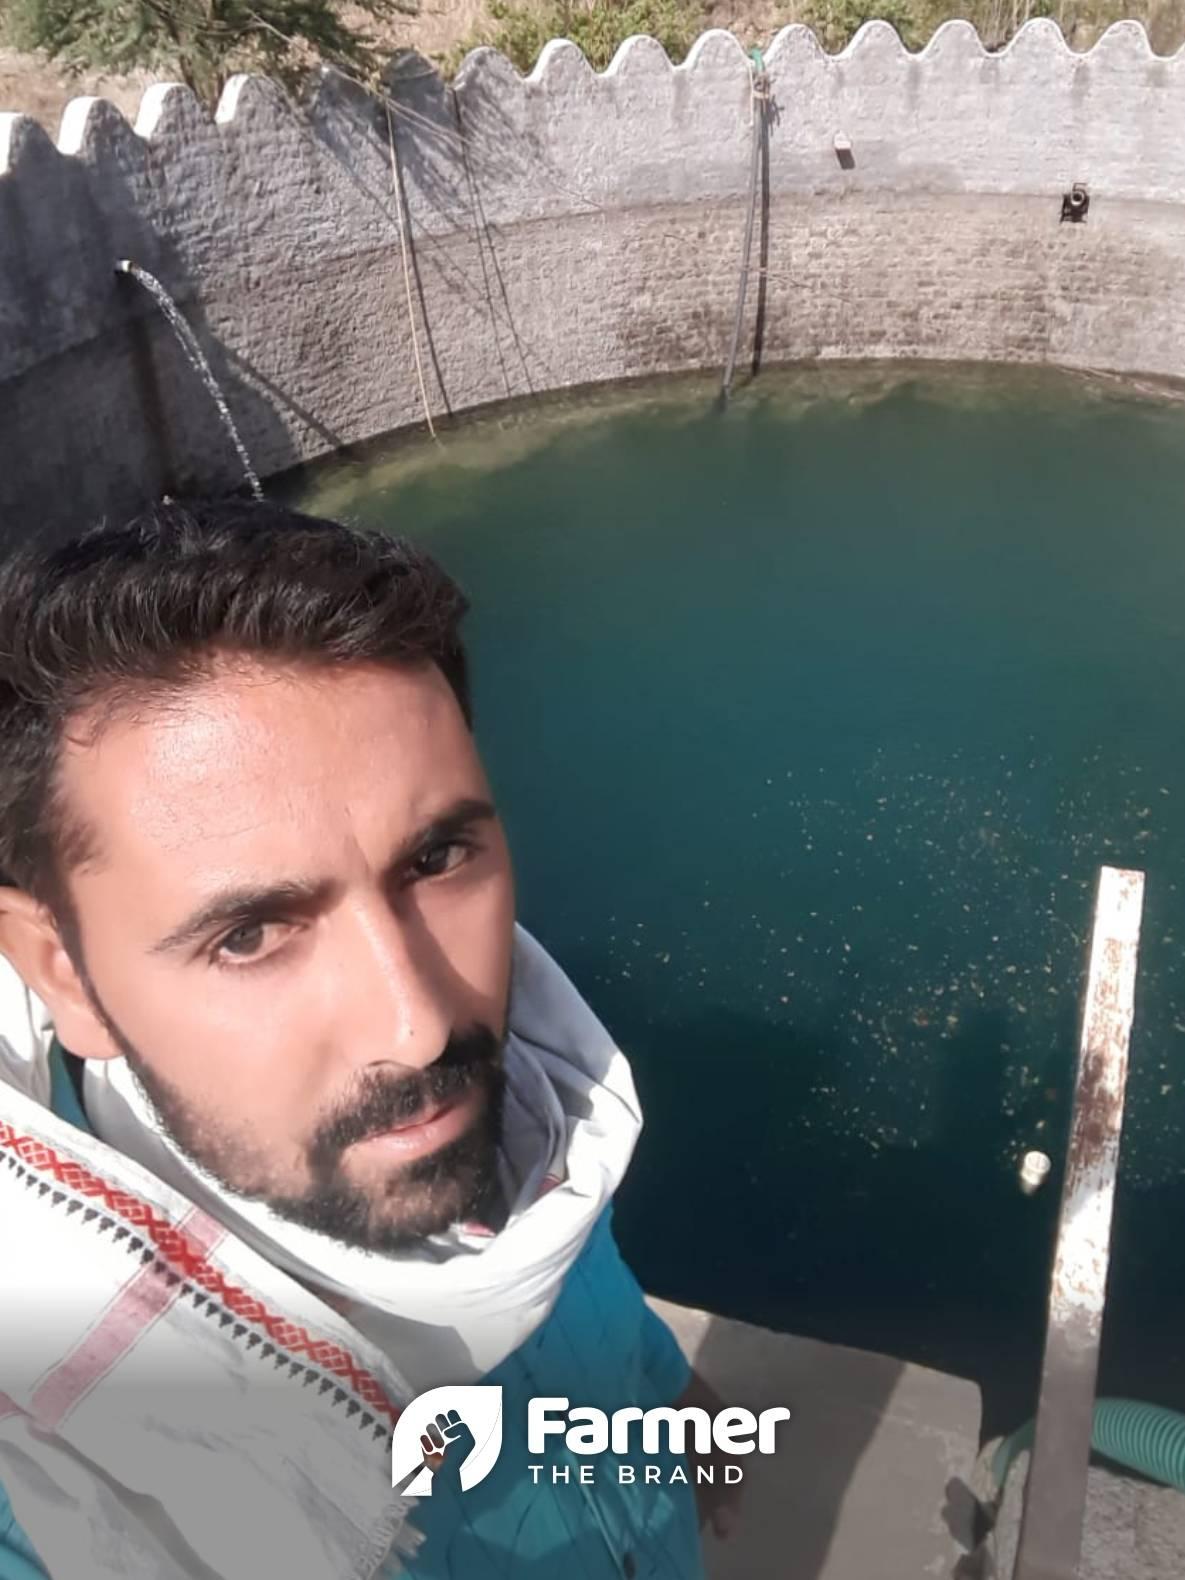 Bhagwat Sharma